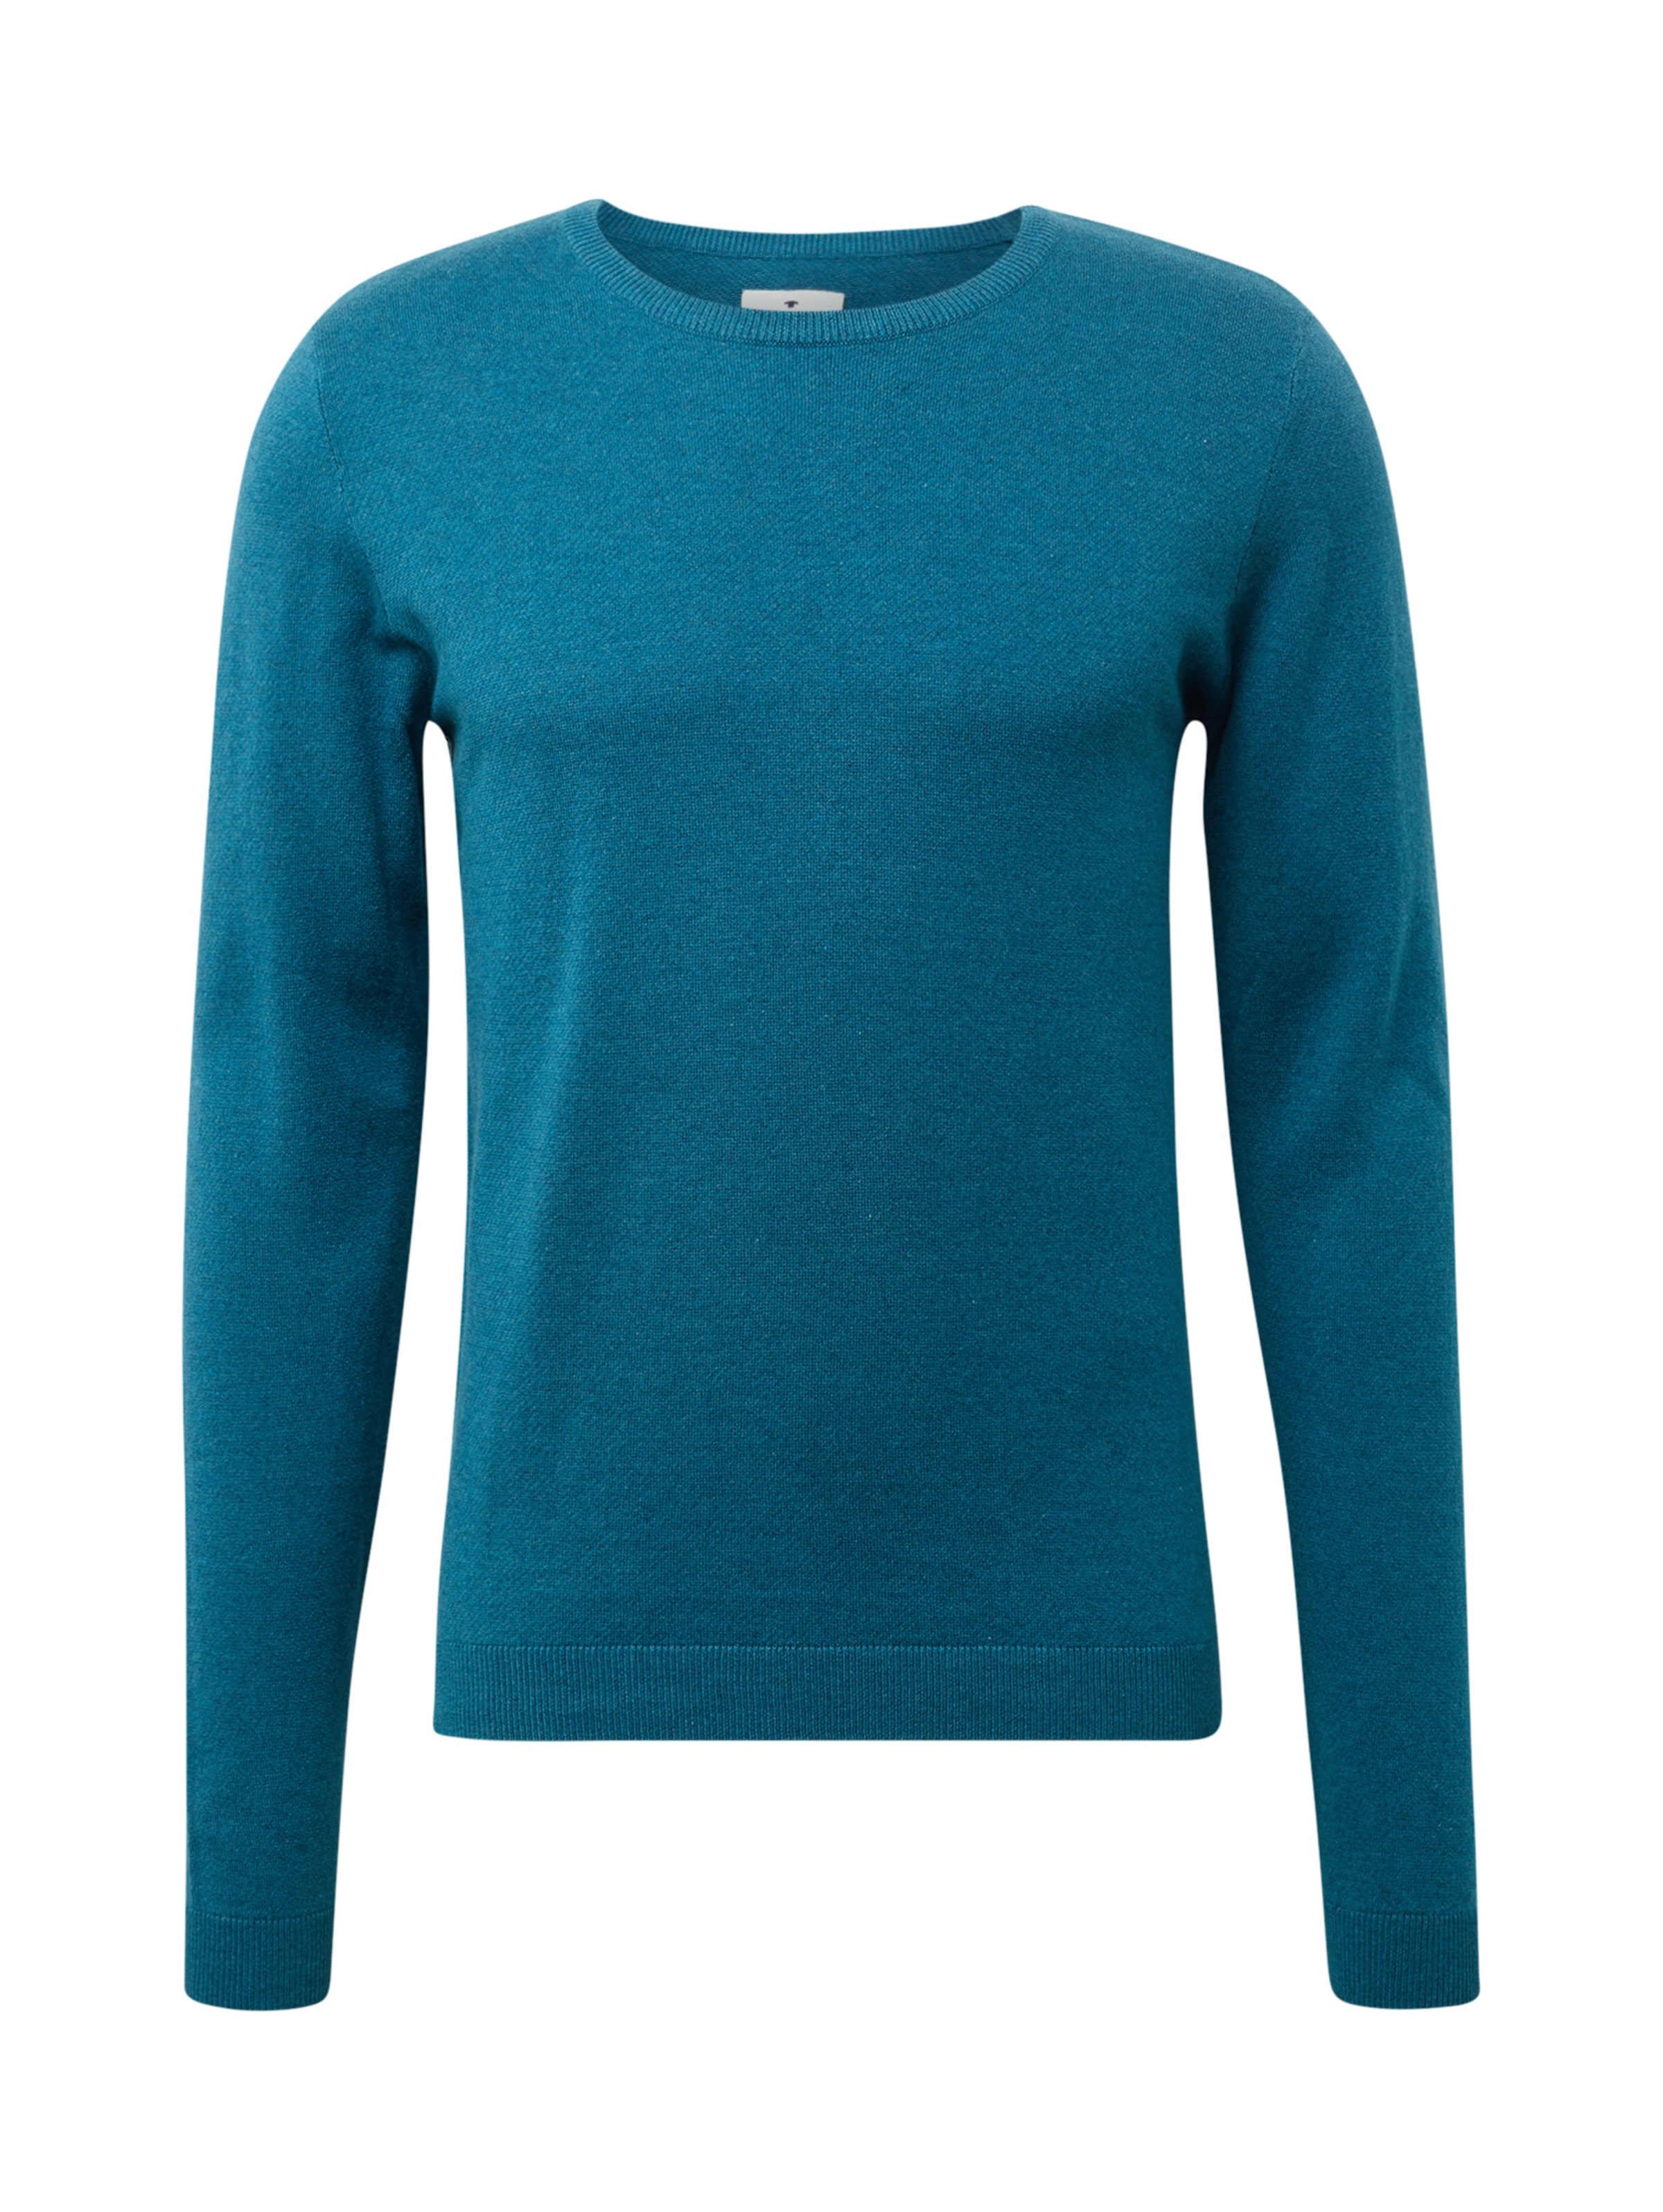 In Tailor Pullover Tom Blau 8wOm0vNny